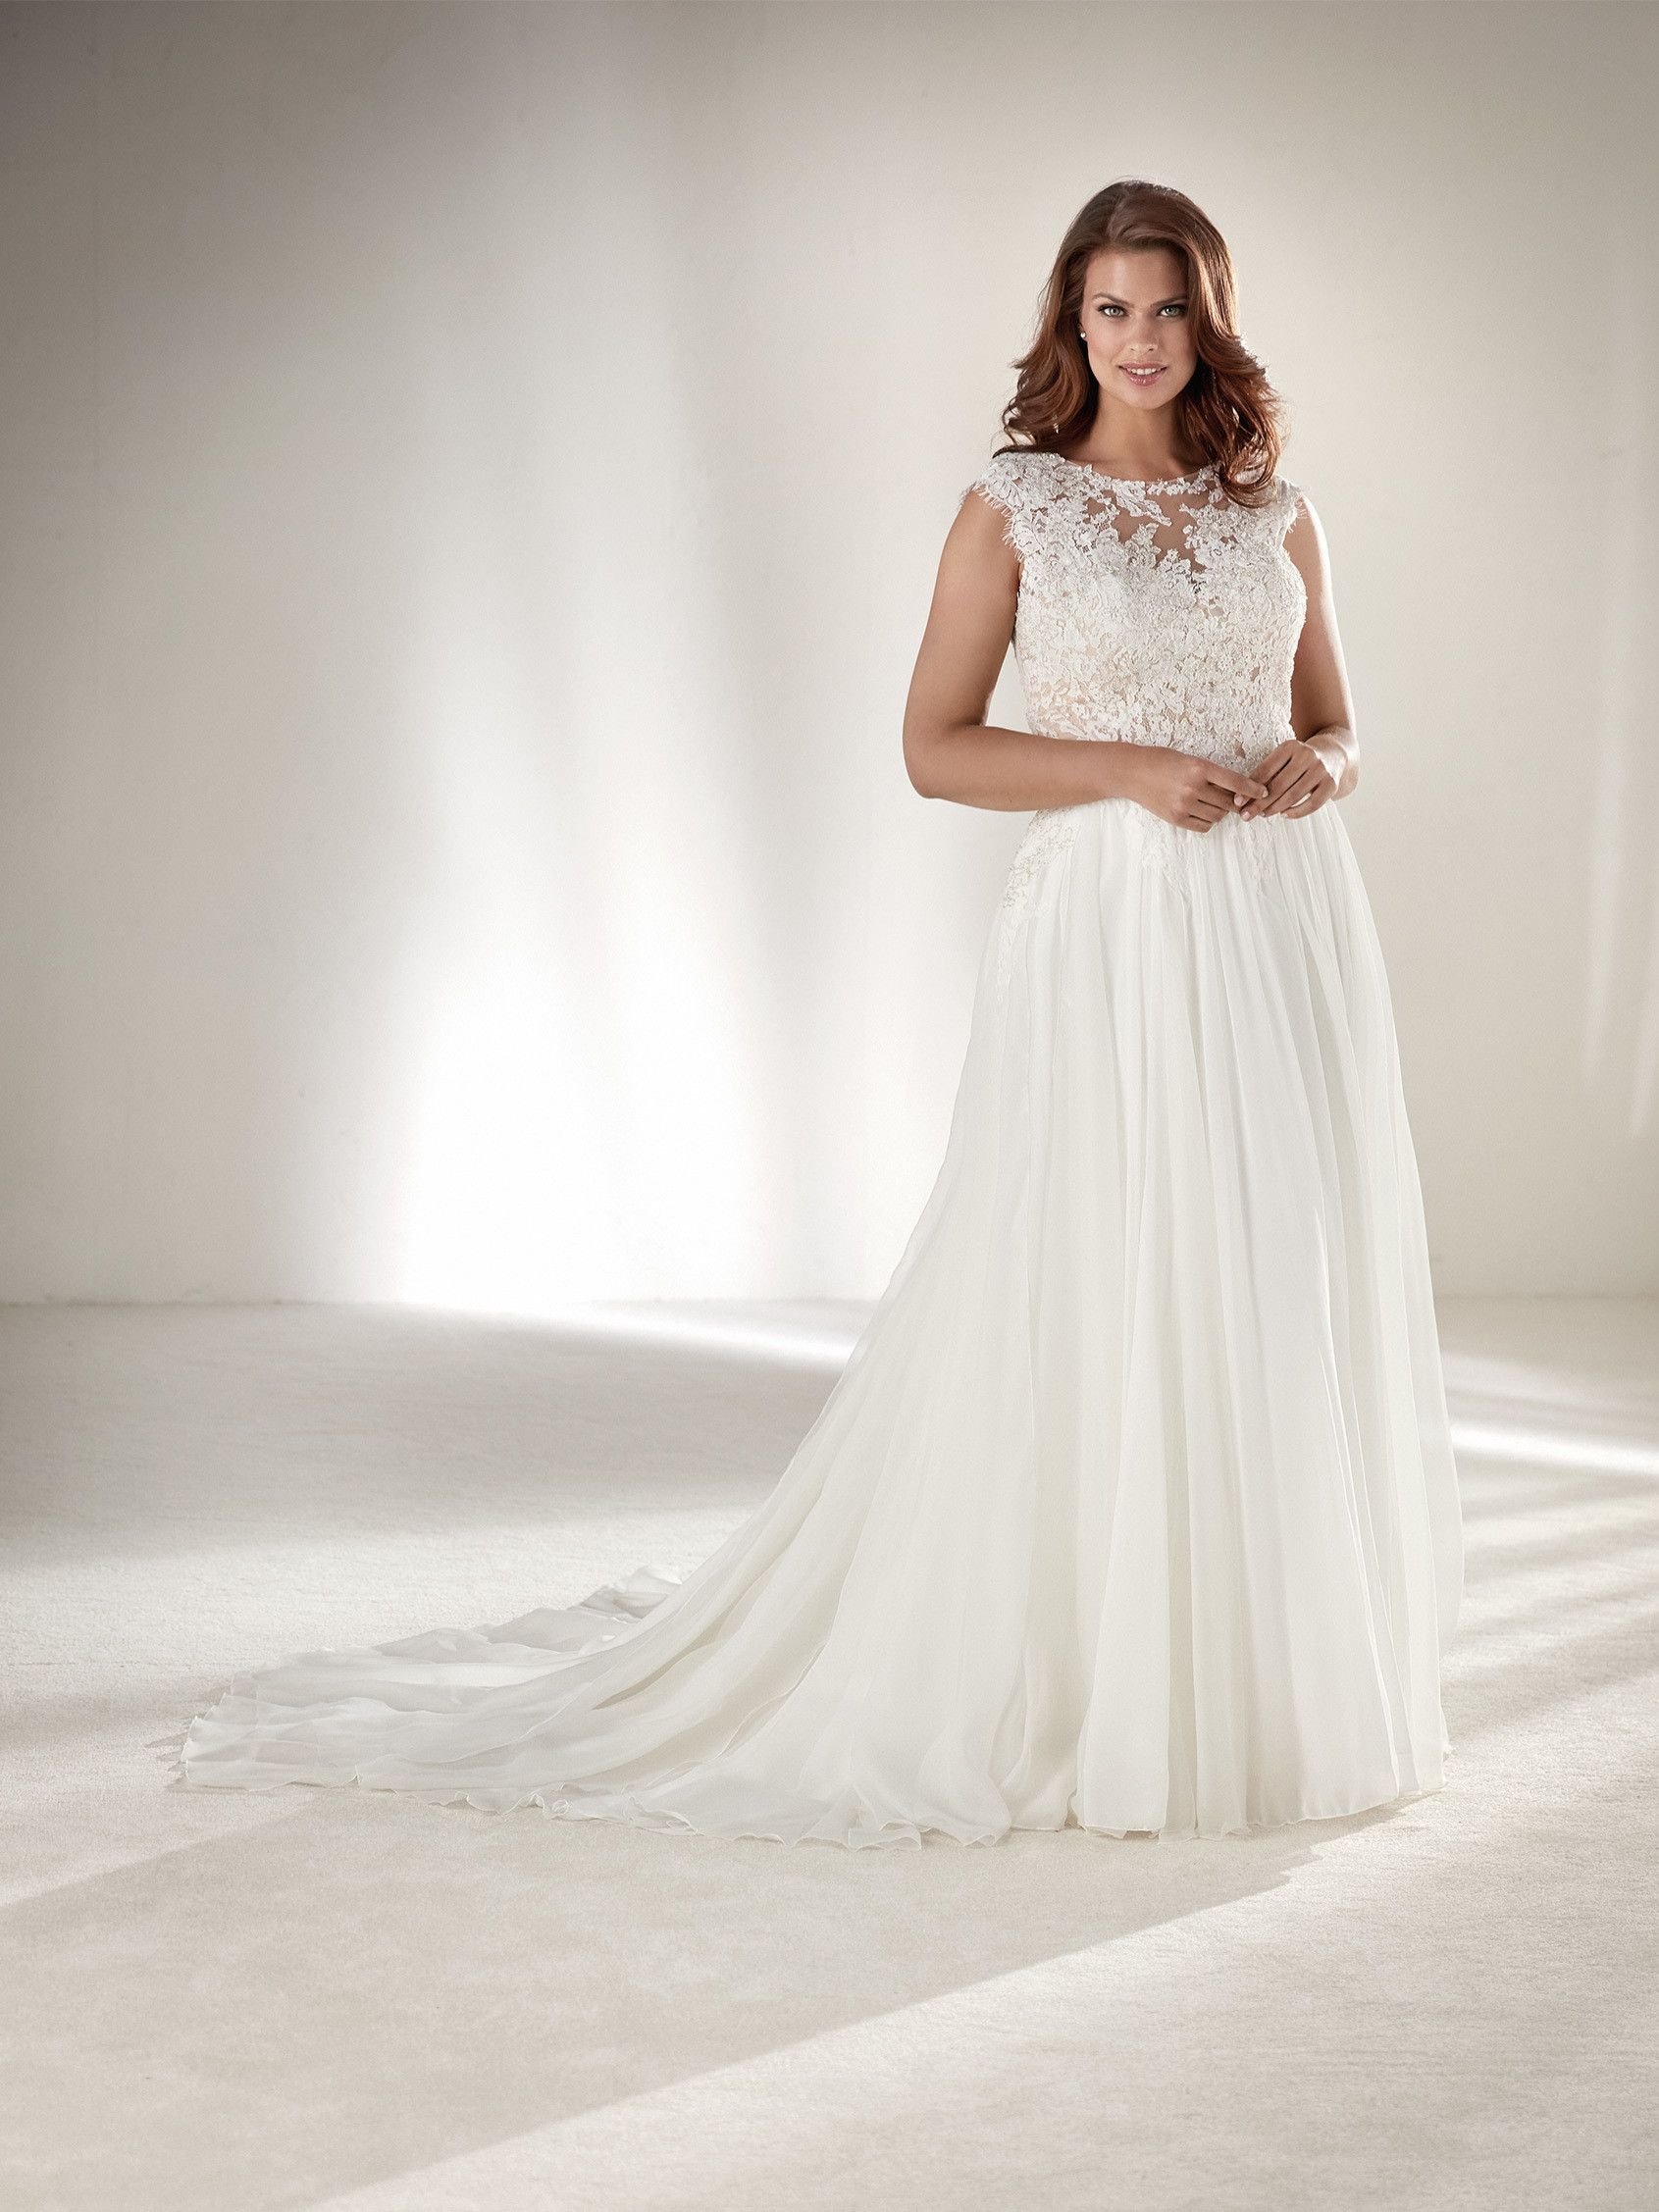 Plus-size high-necked wedding dress - Pronovias 2018 Collection | My ...